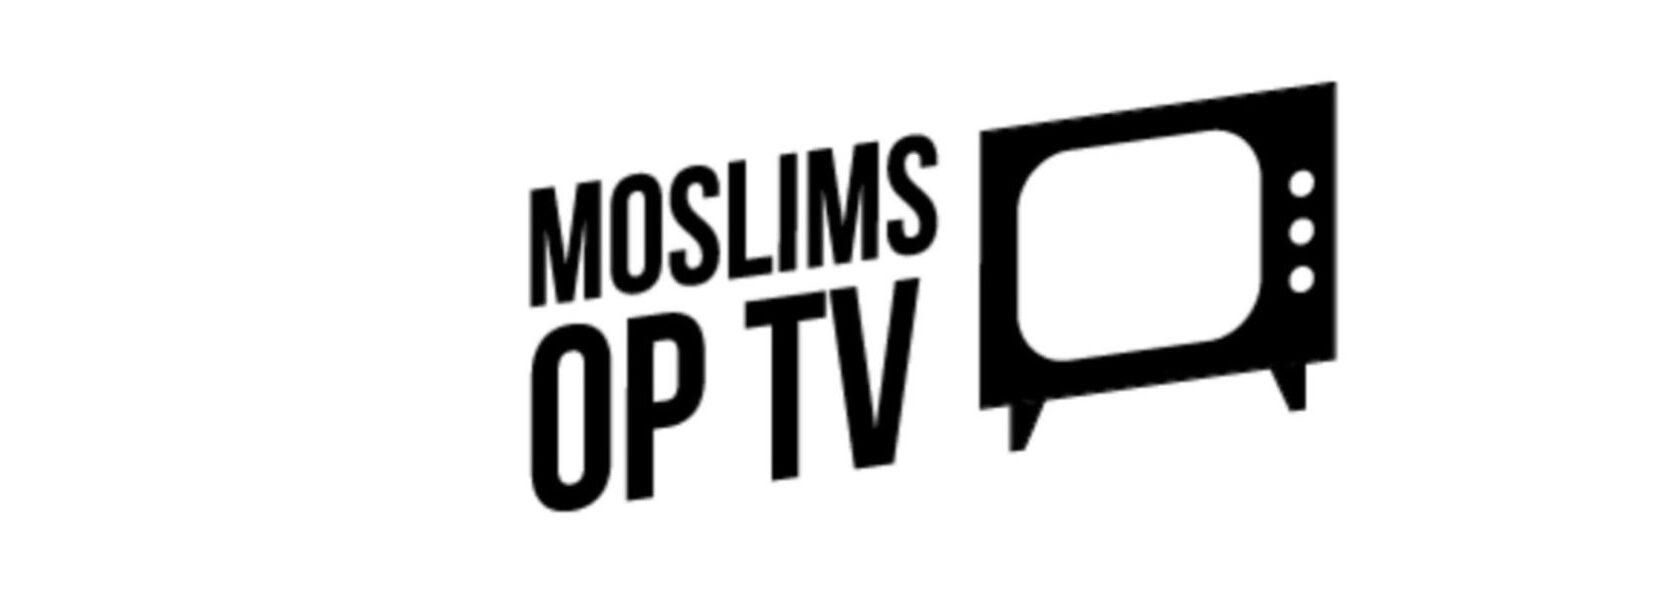 moslimsoptv banner2